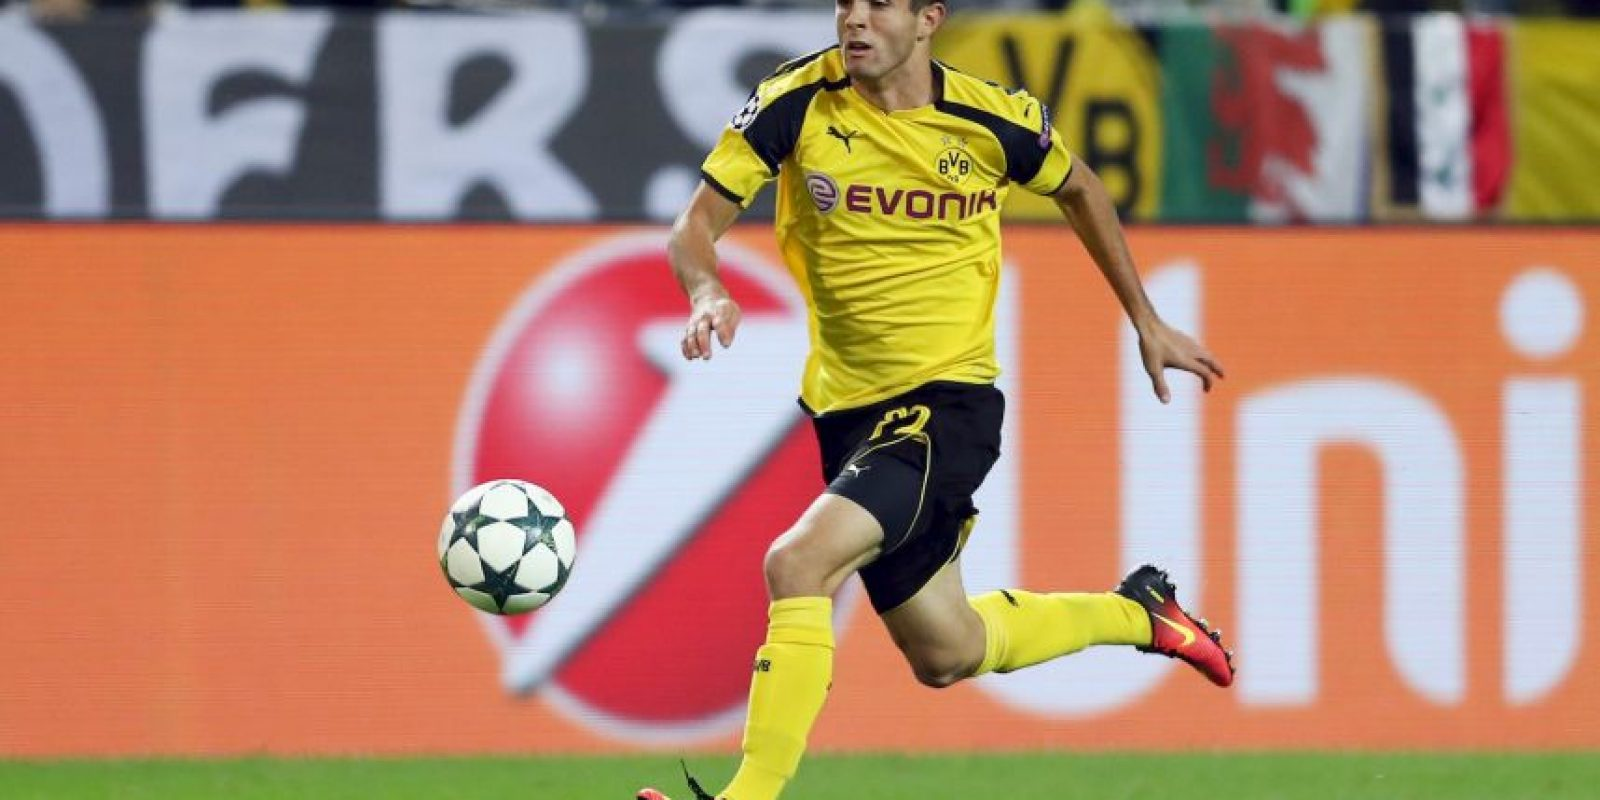 Getty Images Foto:15.-Christian Pulisic – 18 años (Borussia Dortmund)